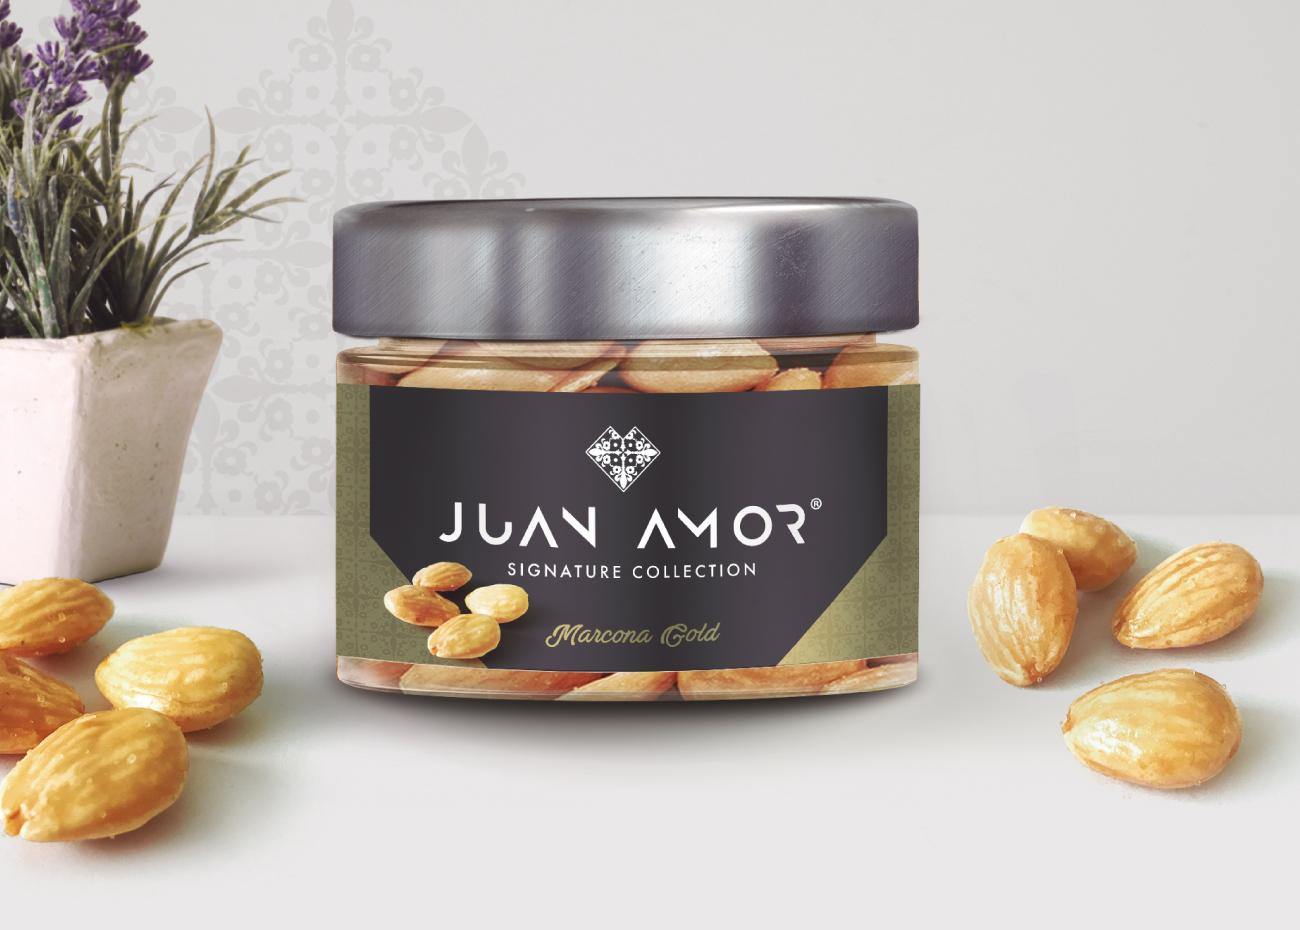 Juan Amor Marcona Gold